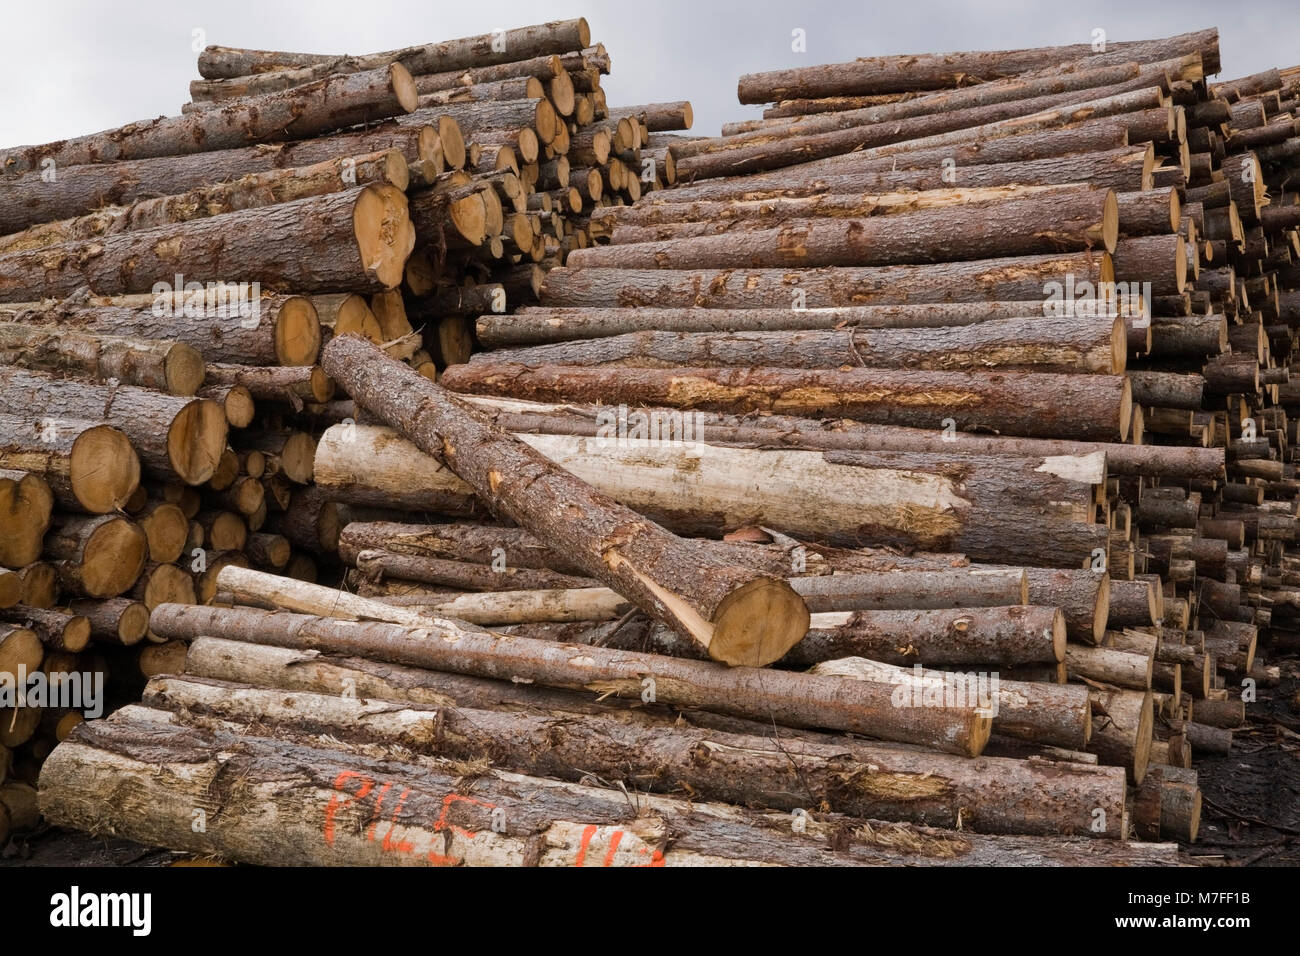 Lumberyard stock photos lumberyard stock images alamy for Pine tree timber